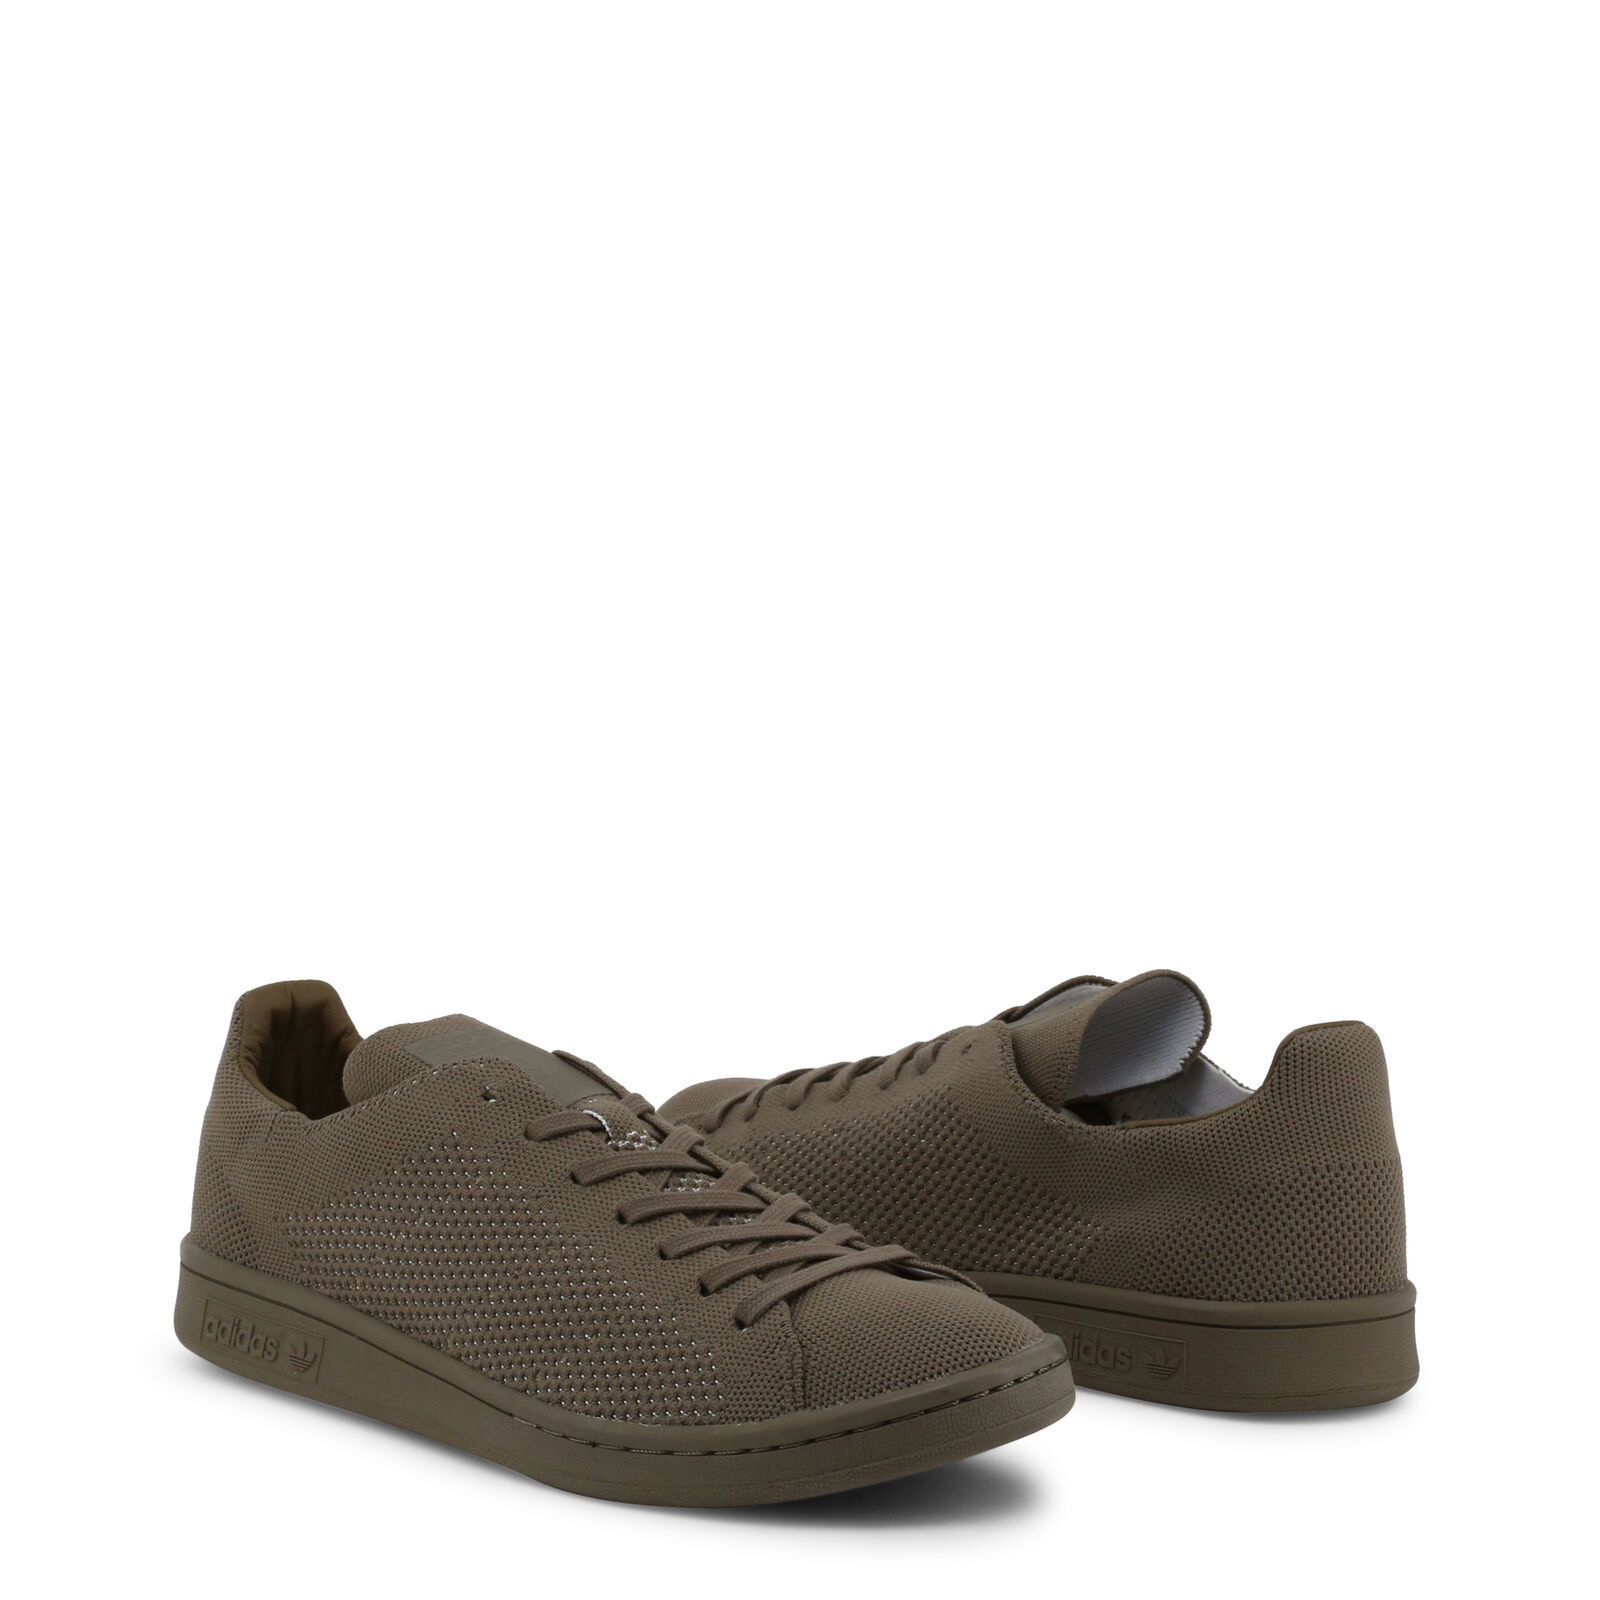 Adidas Stansmith_Primeknit Man Green 99493